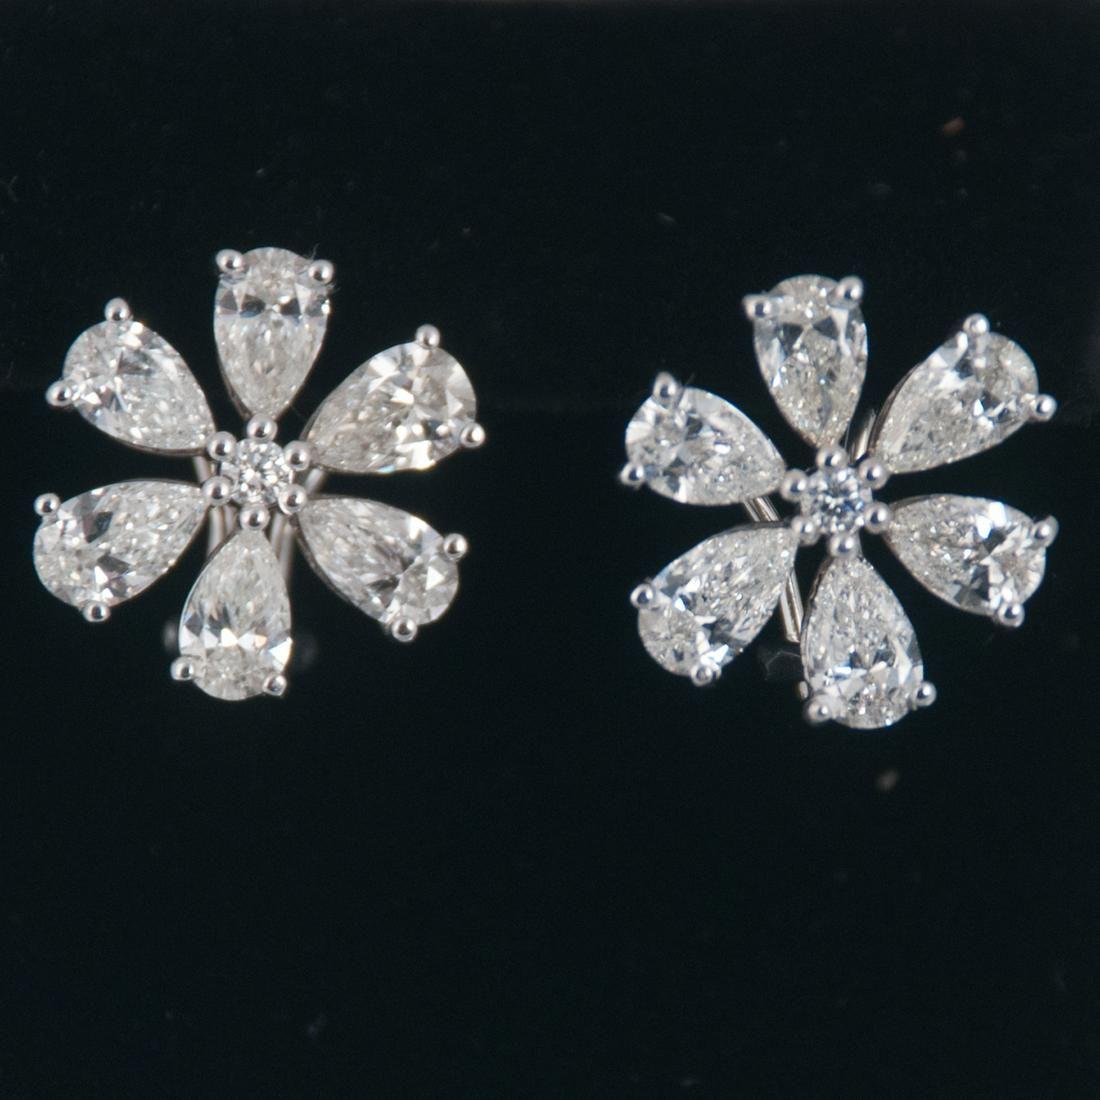 Pair of Cartier style 14K white gold diamond flower